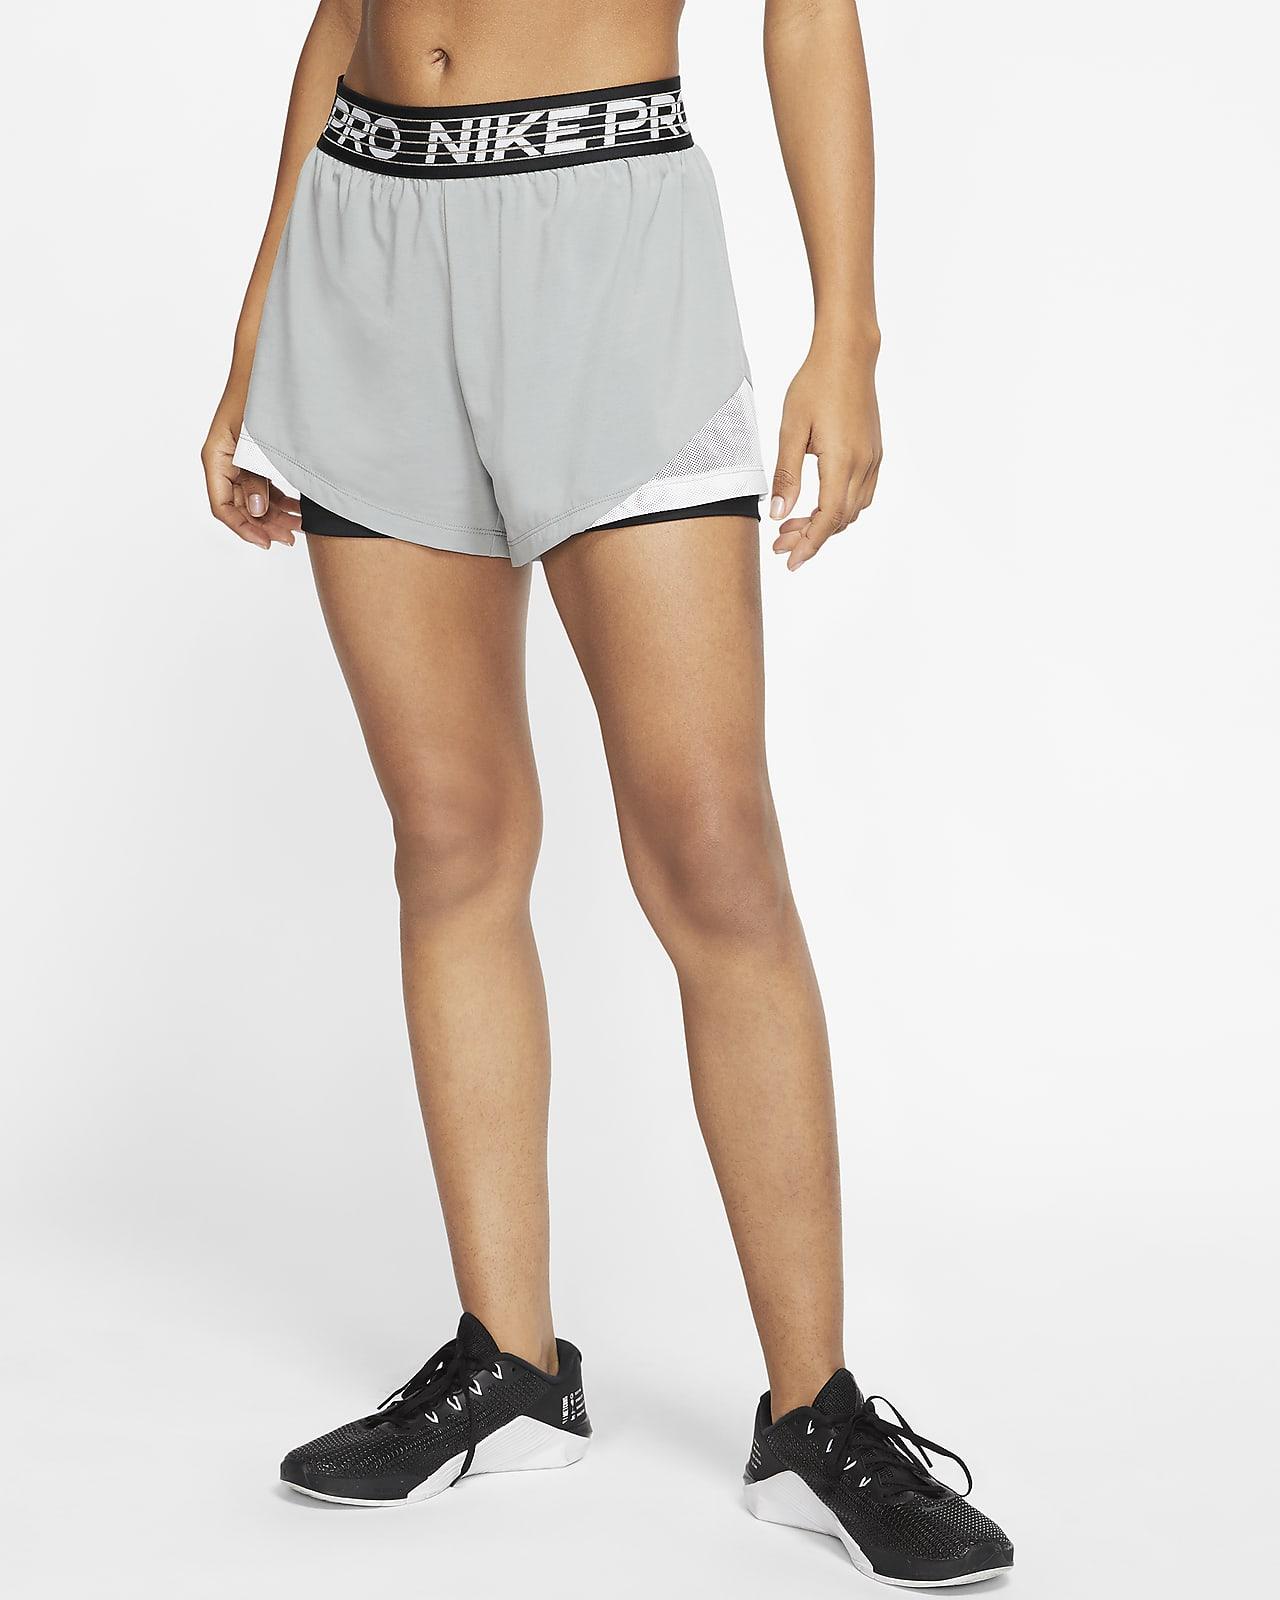 Shorts 2 en 1 para mujer Nike Pro Flex